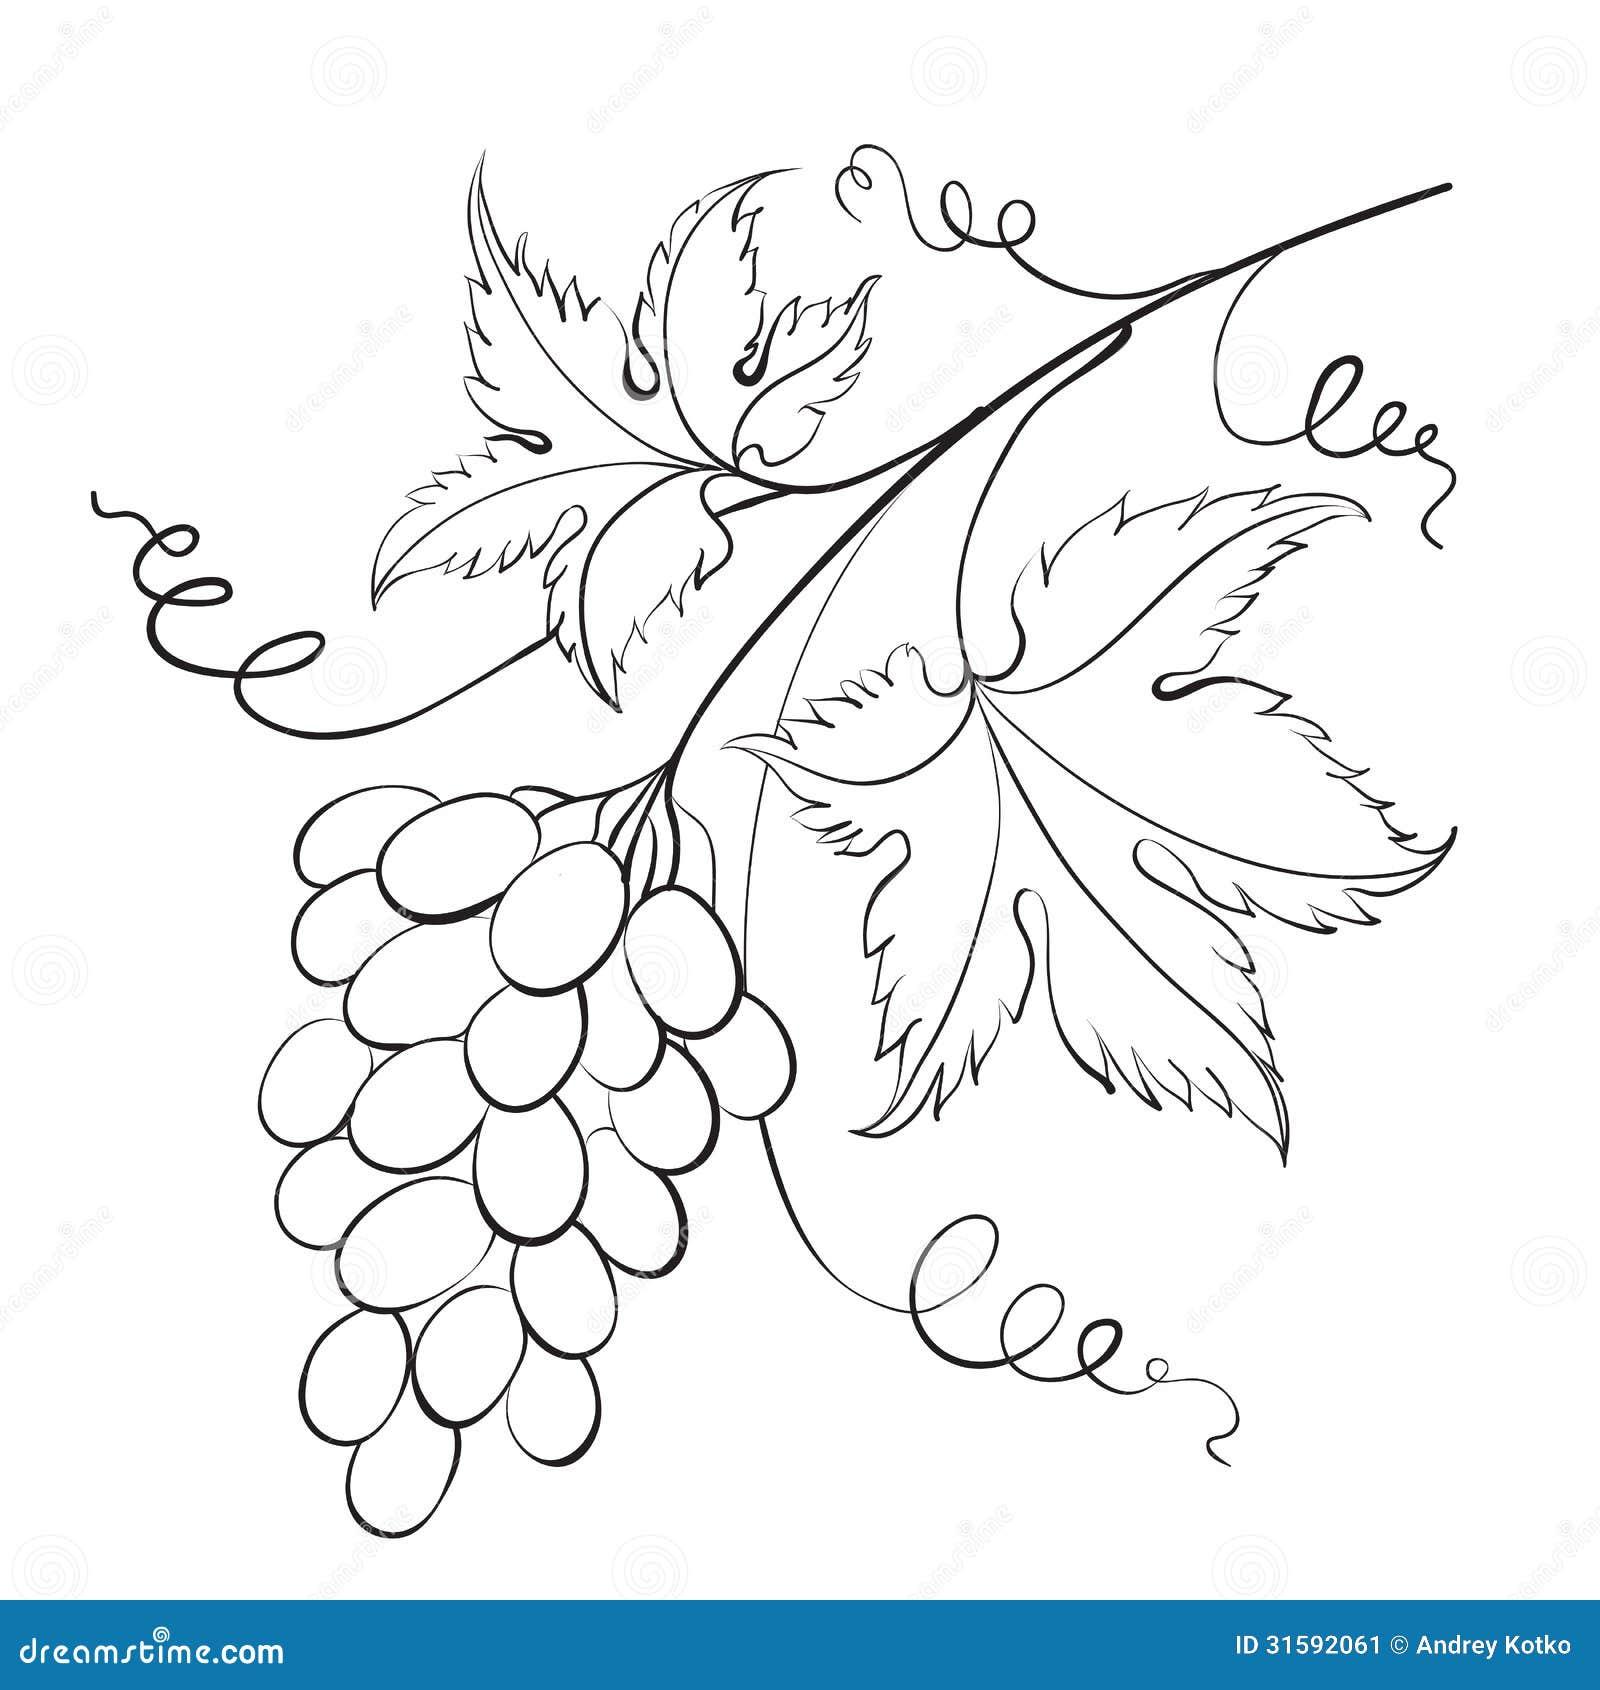 Grape Vine Branches Ornament Vector Stock Vector - Illustration ... for Drawing Grape Vines  131fsj